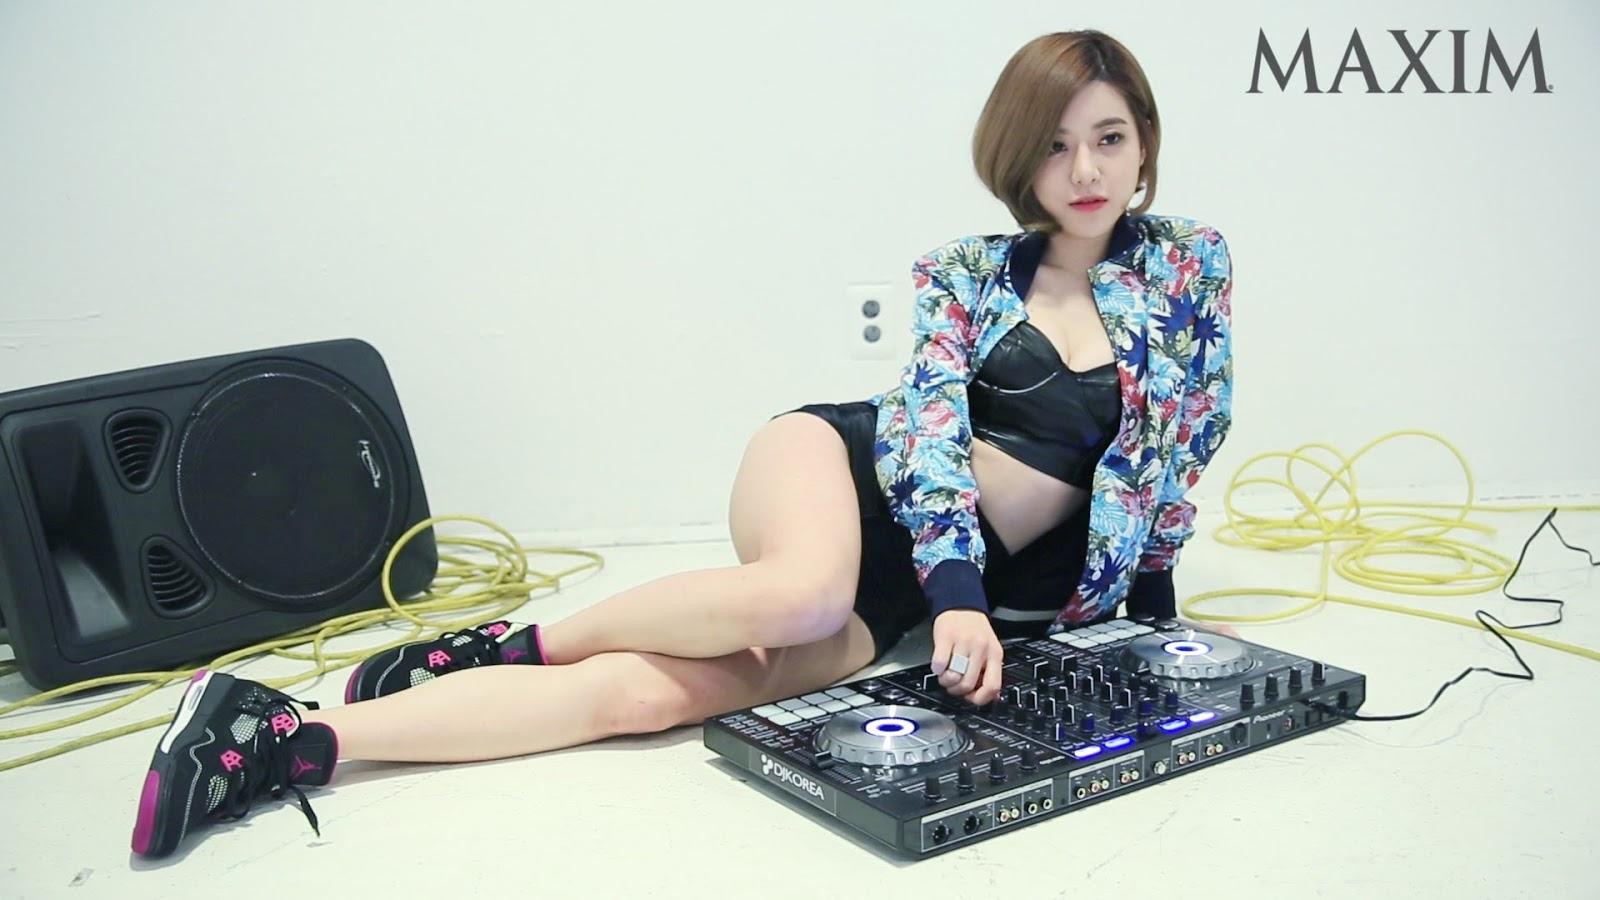 dj soda maxim Korea